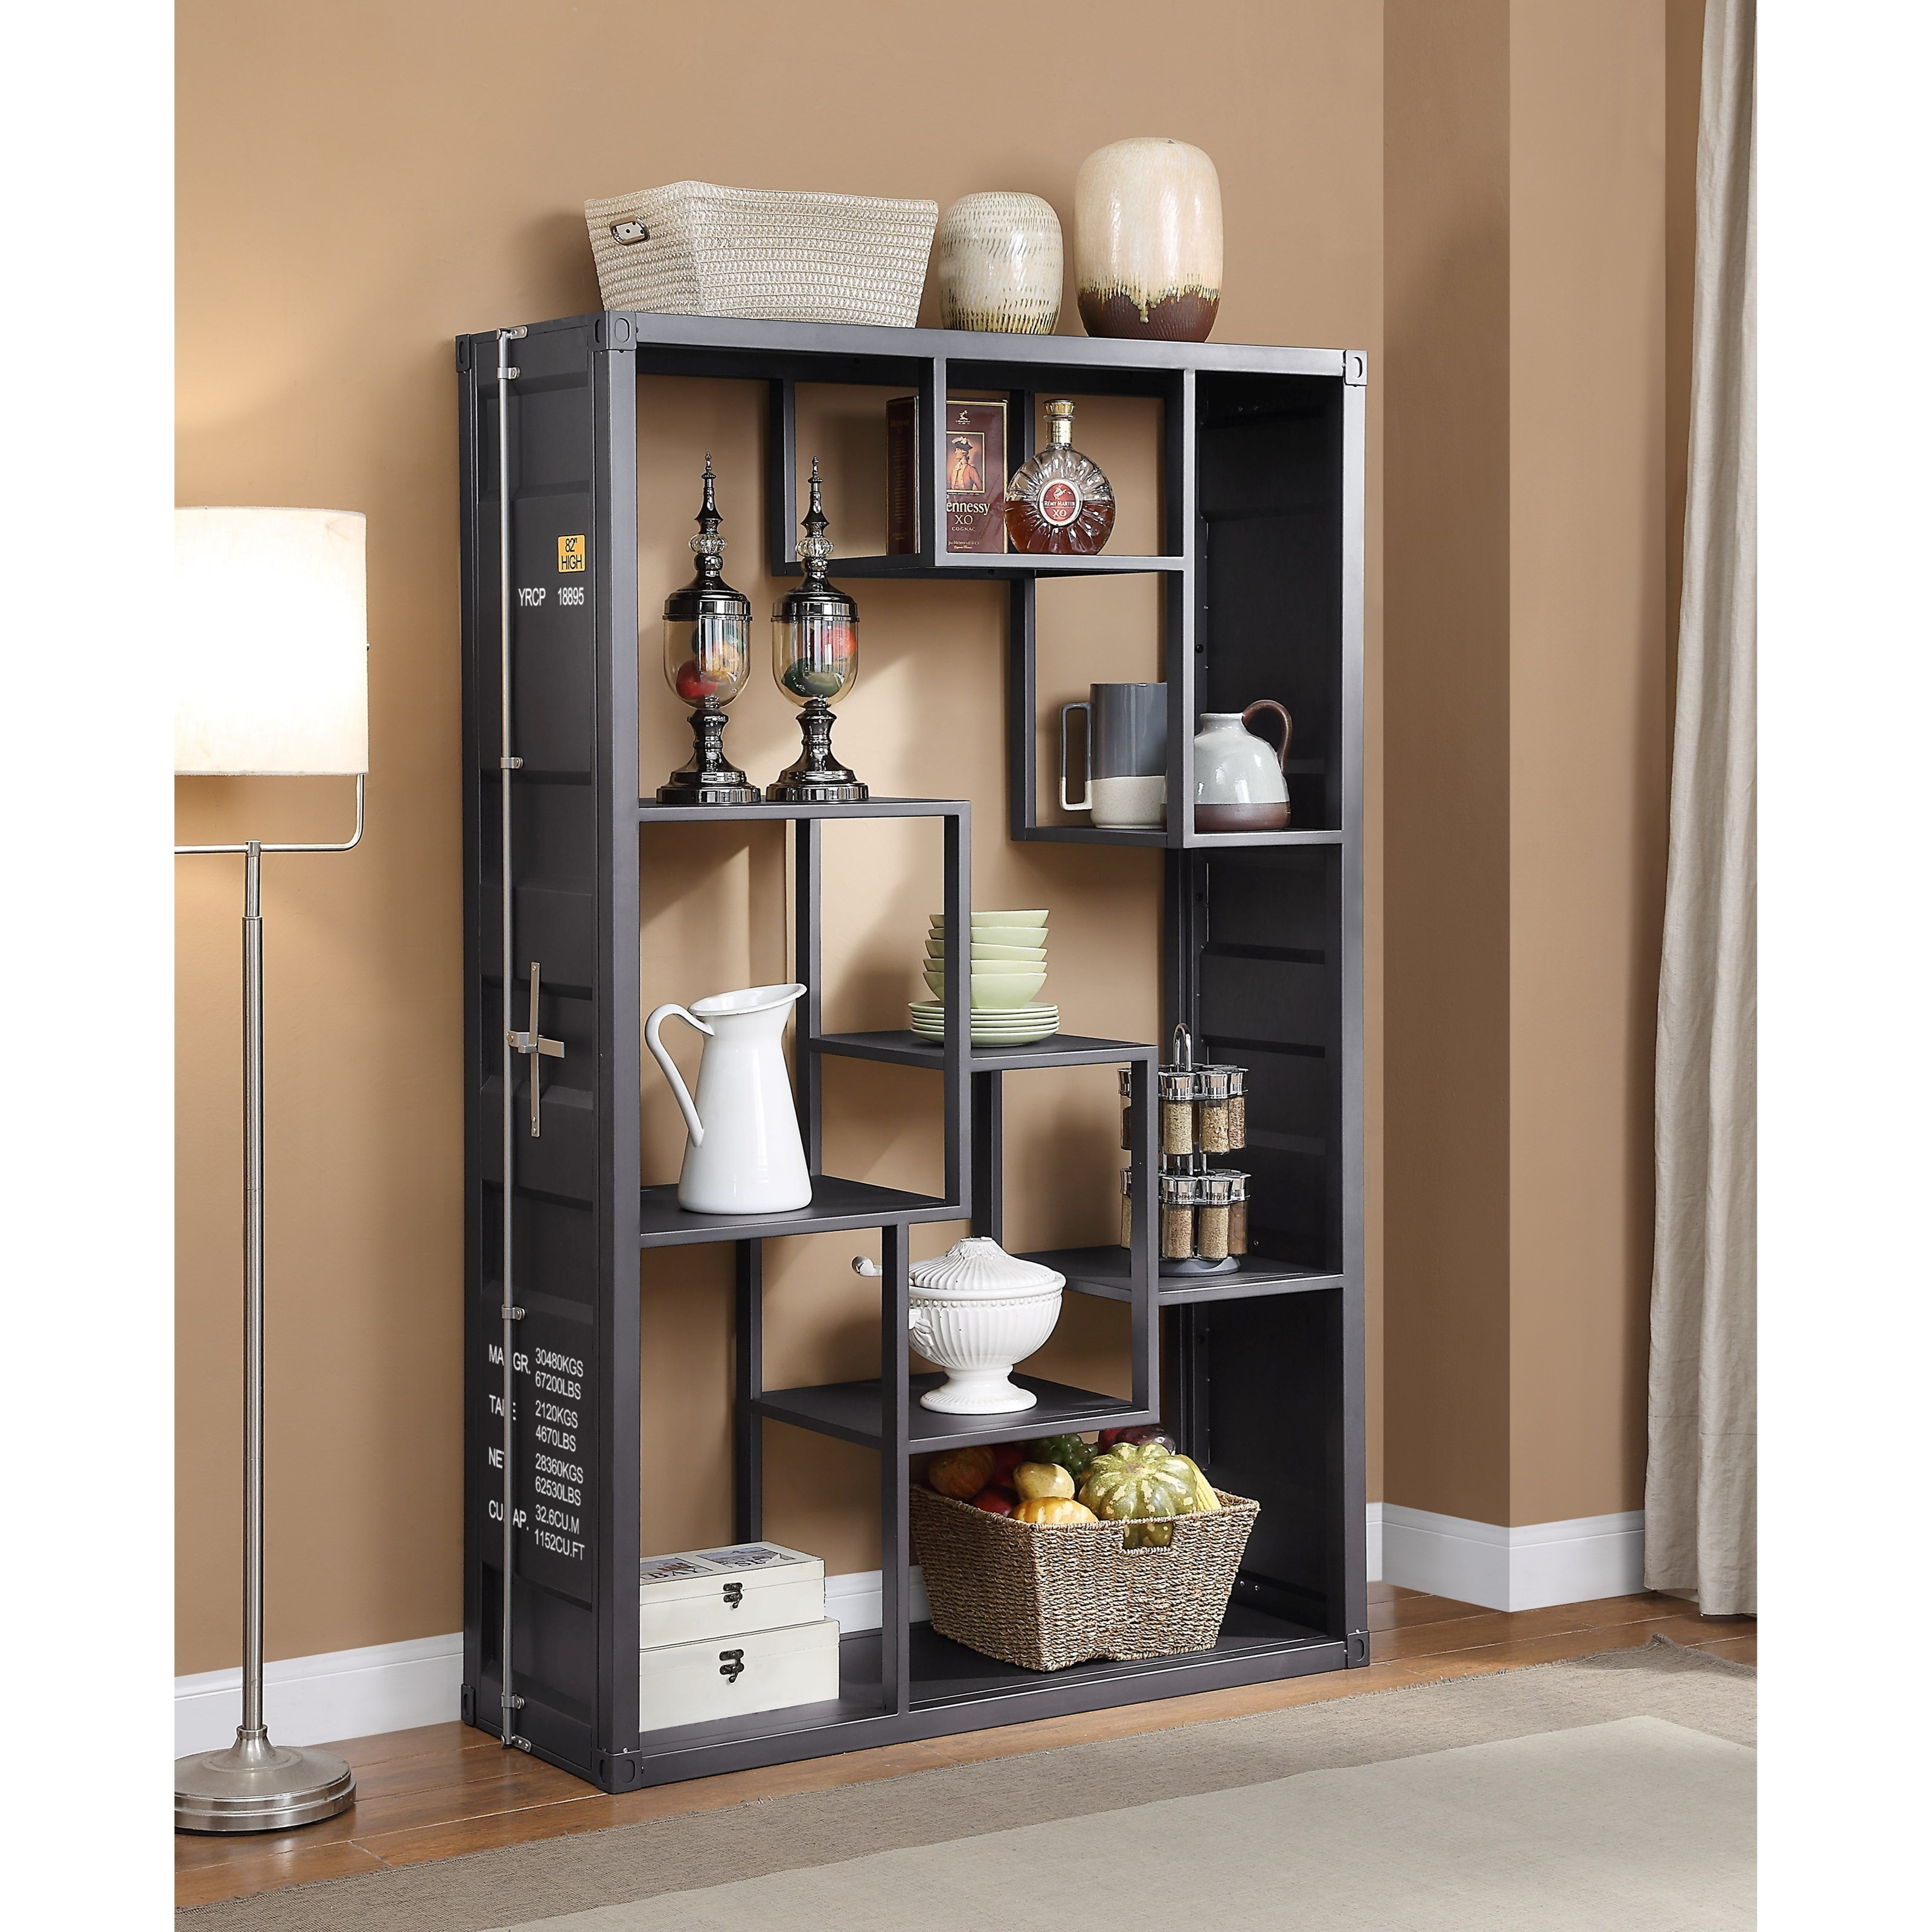 Cargo Shelf Rack / Book Shelf by Acme Furniture at Carolina Direct